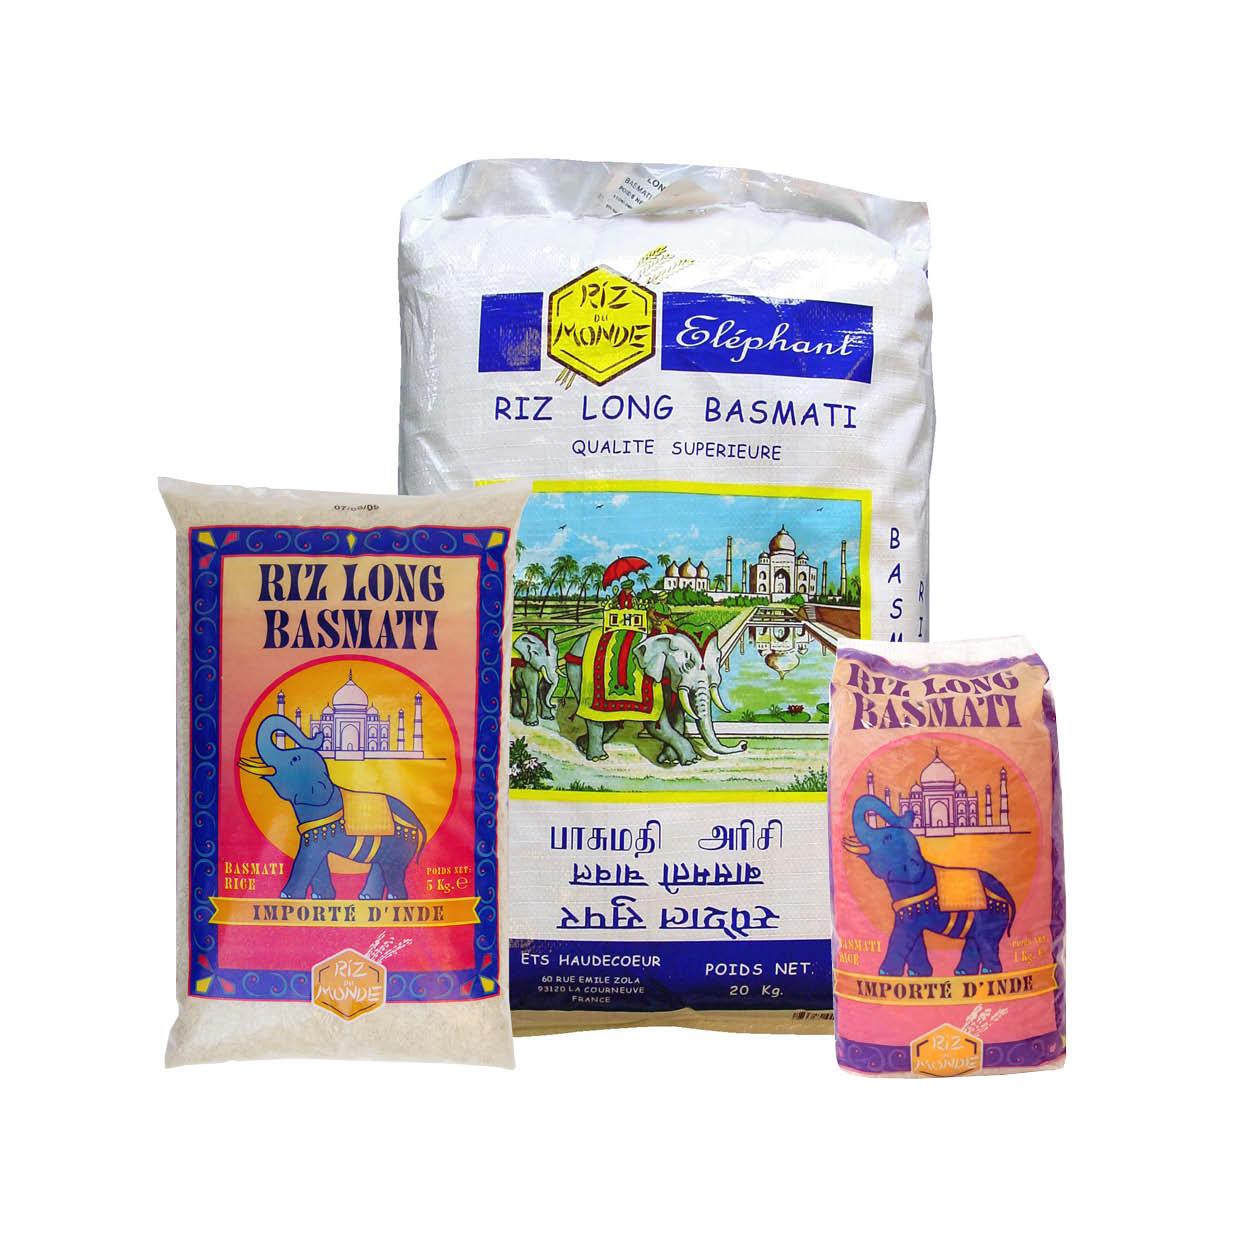 Basmati rice ELEPHANT – Haudecoeur